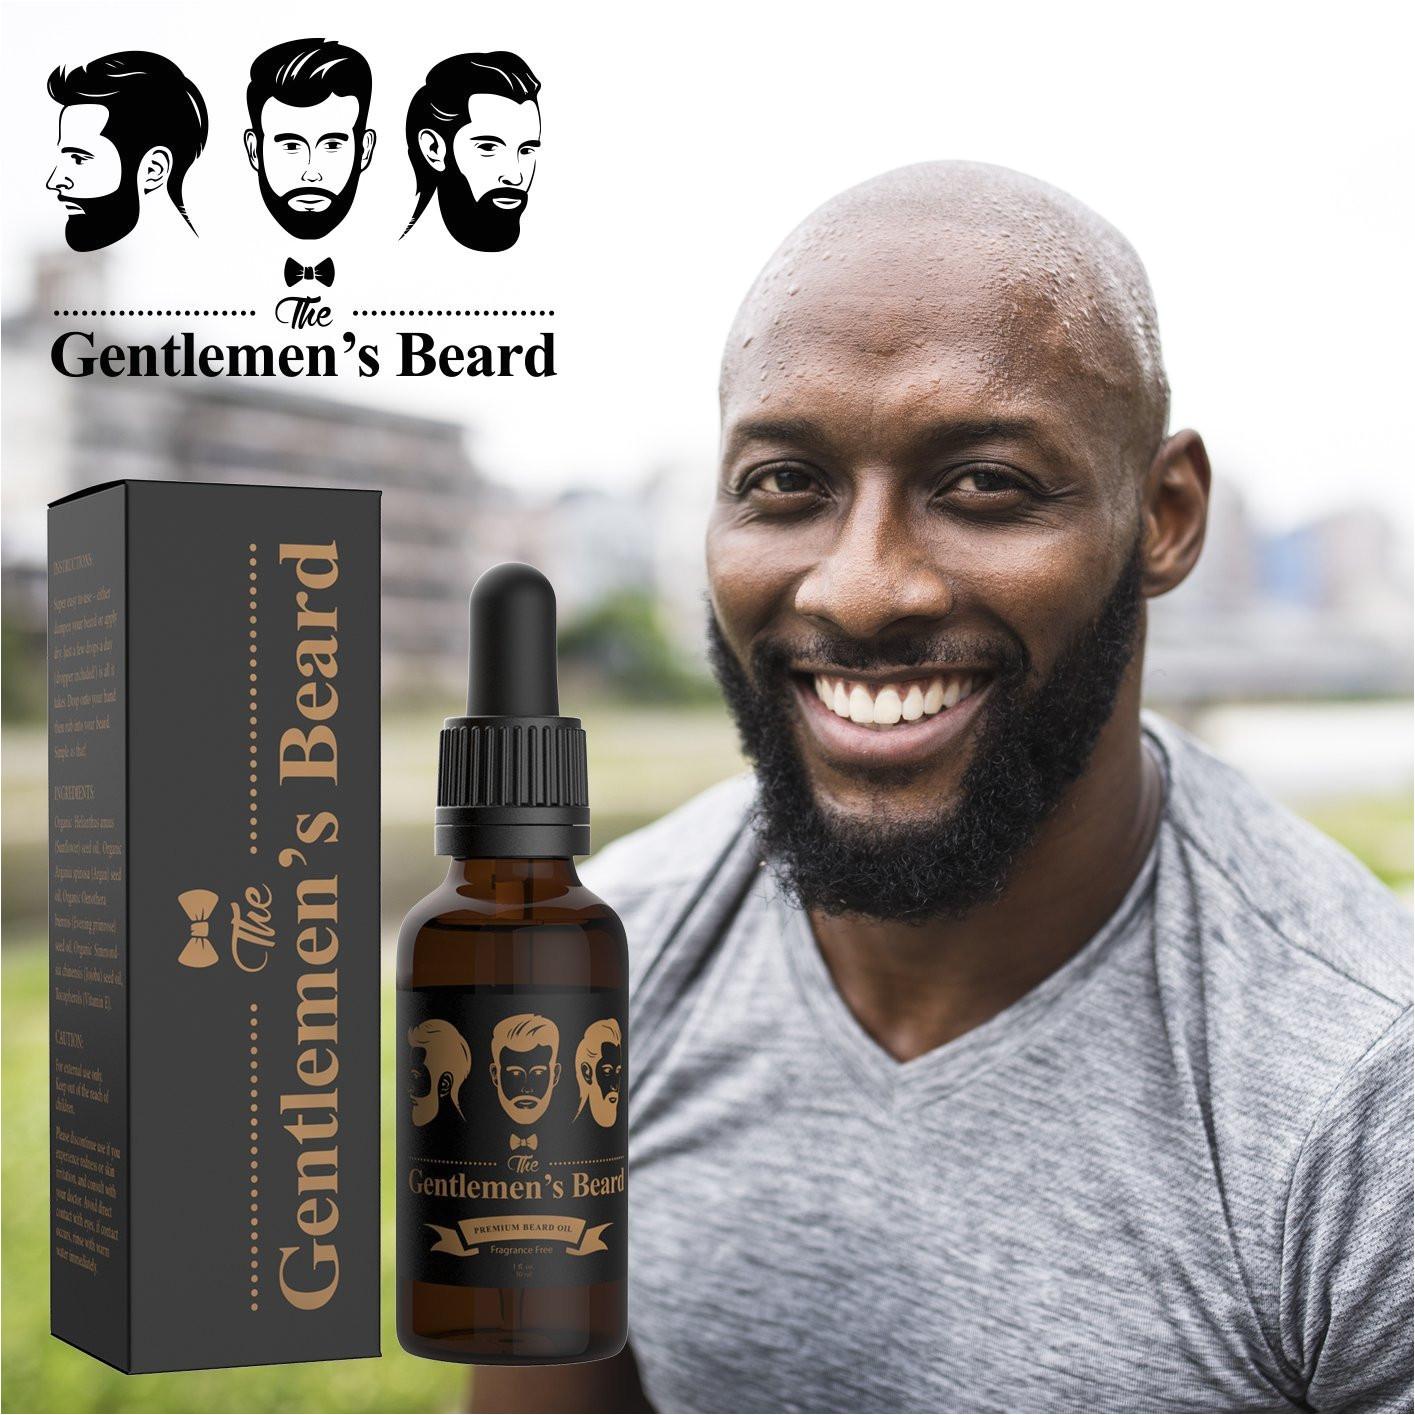 amazon com the gentlemen s beard premium beard oil leave in conditioner softener fragrance free beauty